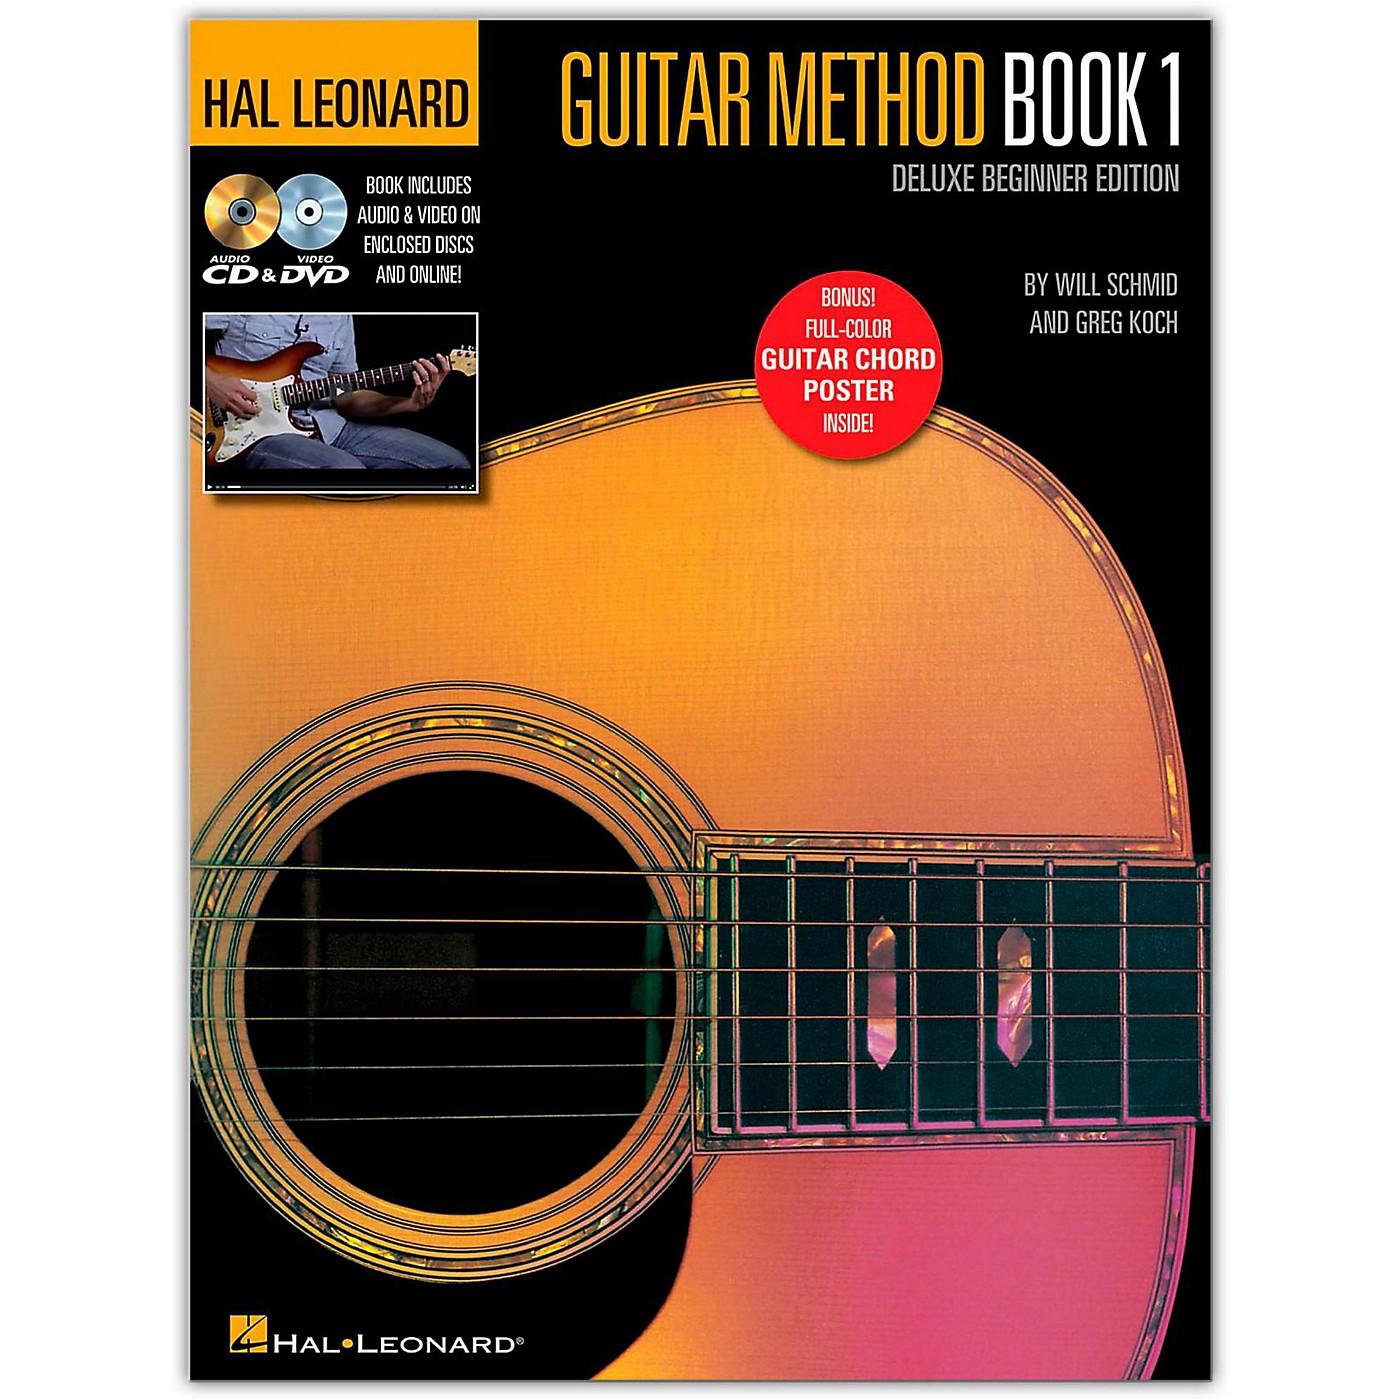 Hal Leonard Hal Leonard Guitar Method Book 1 Deluxe Beginner Edition (Book/DVD/Online Audio/Poster) thumbnail